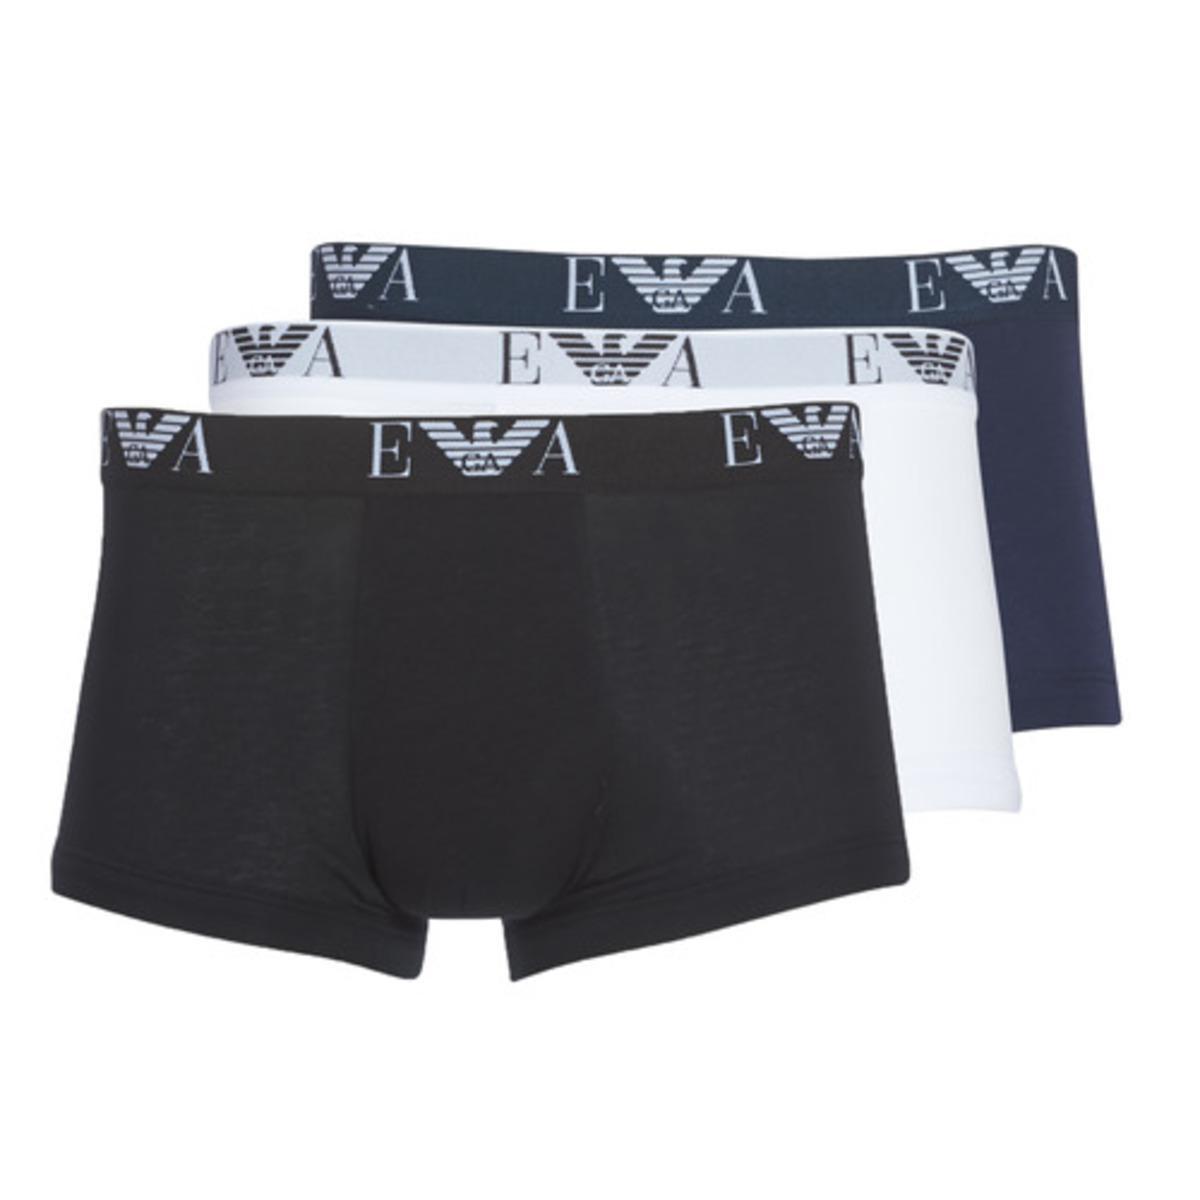 Lot de 3 boxers en coton stretch Emporio Armani - Blanc / Noir / Bleu - Emporio Armani Underwear - Modalova